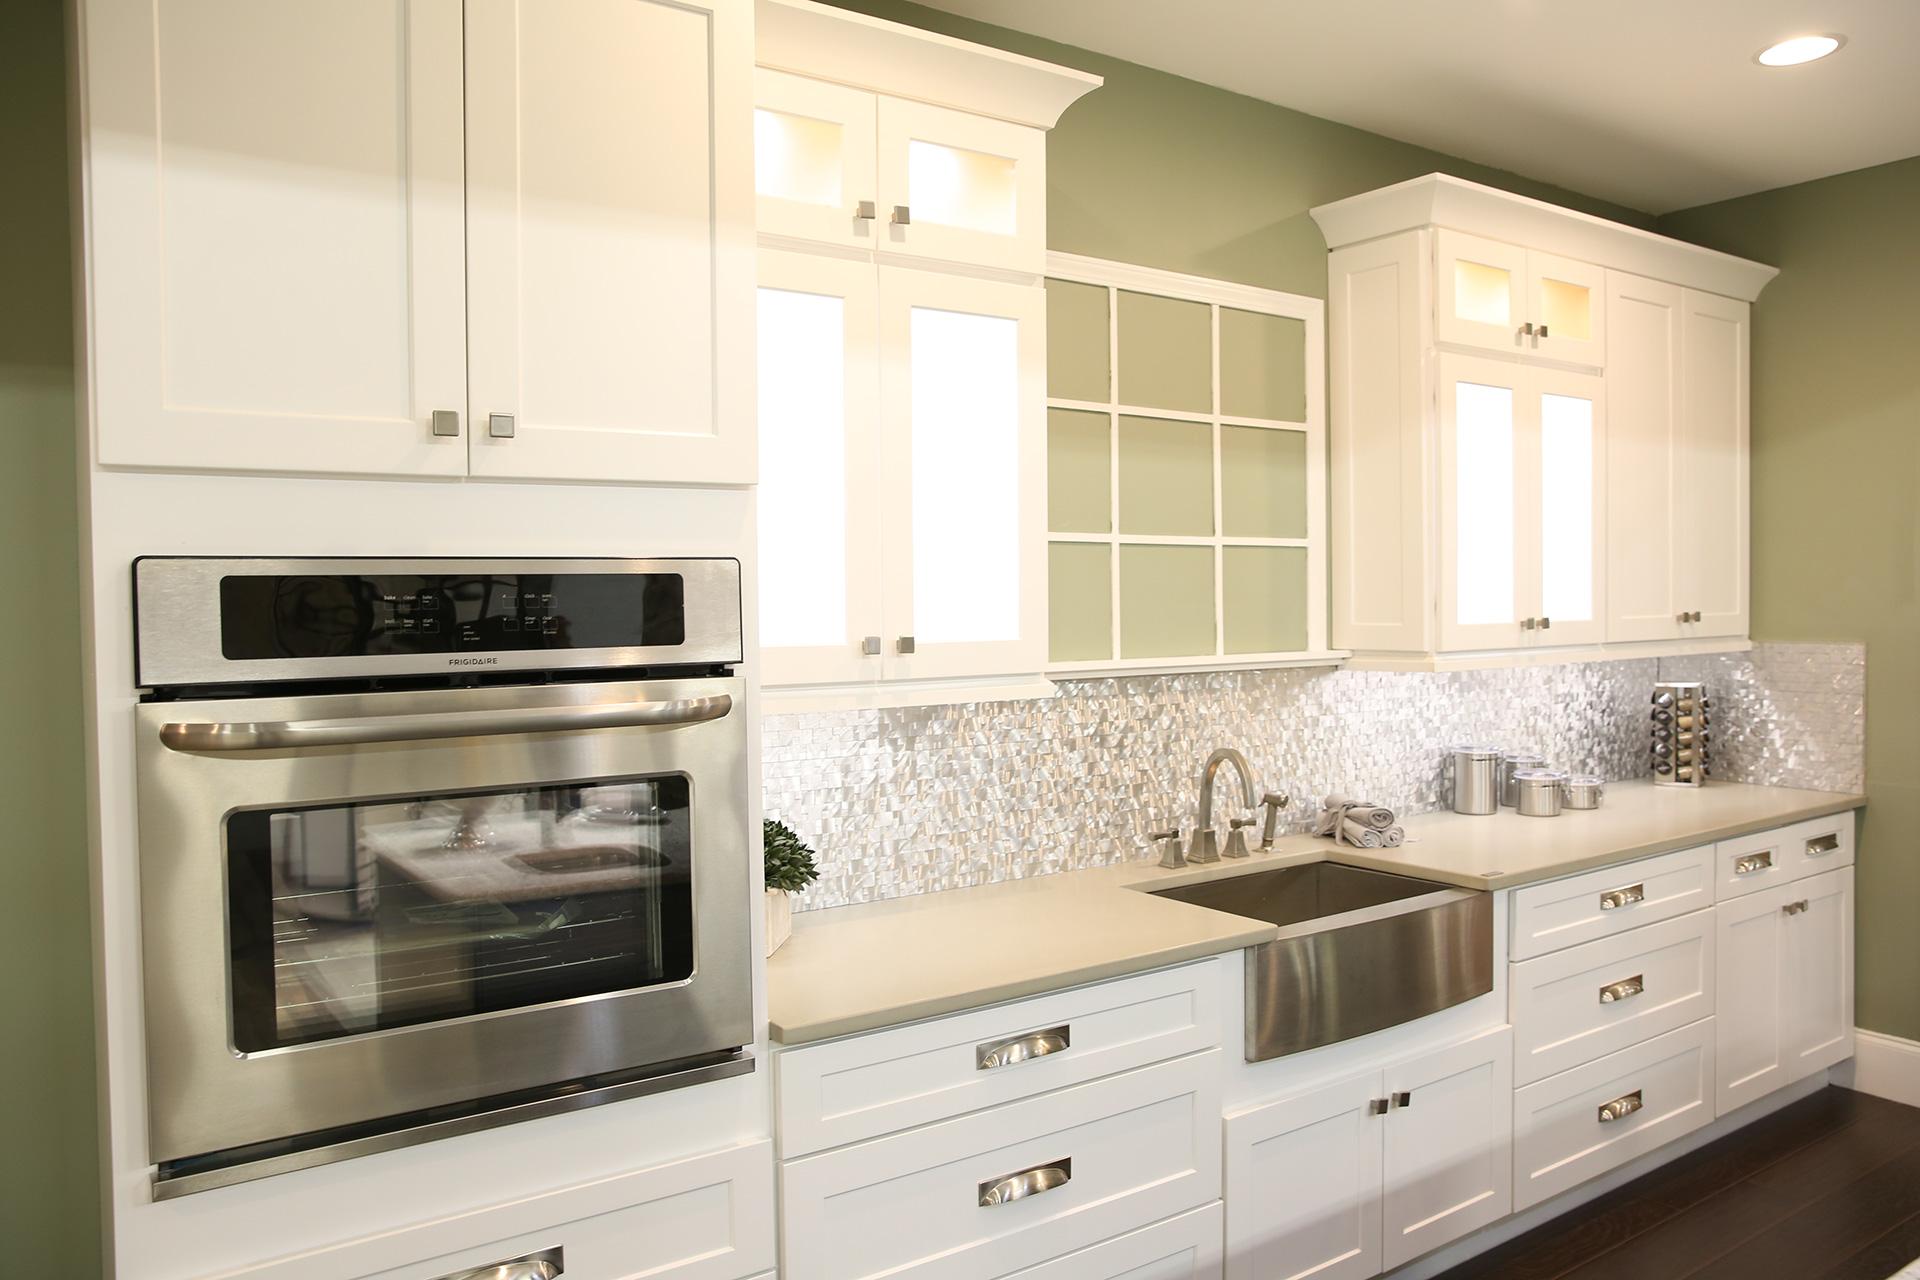 White Shaker-style Kitchen Cabinets